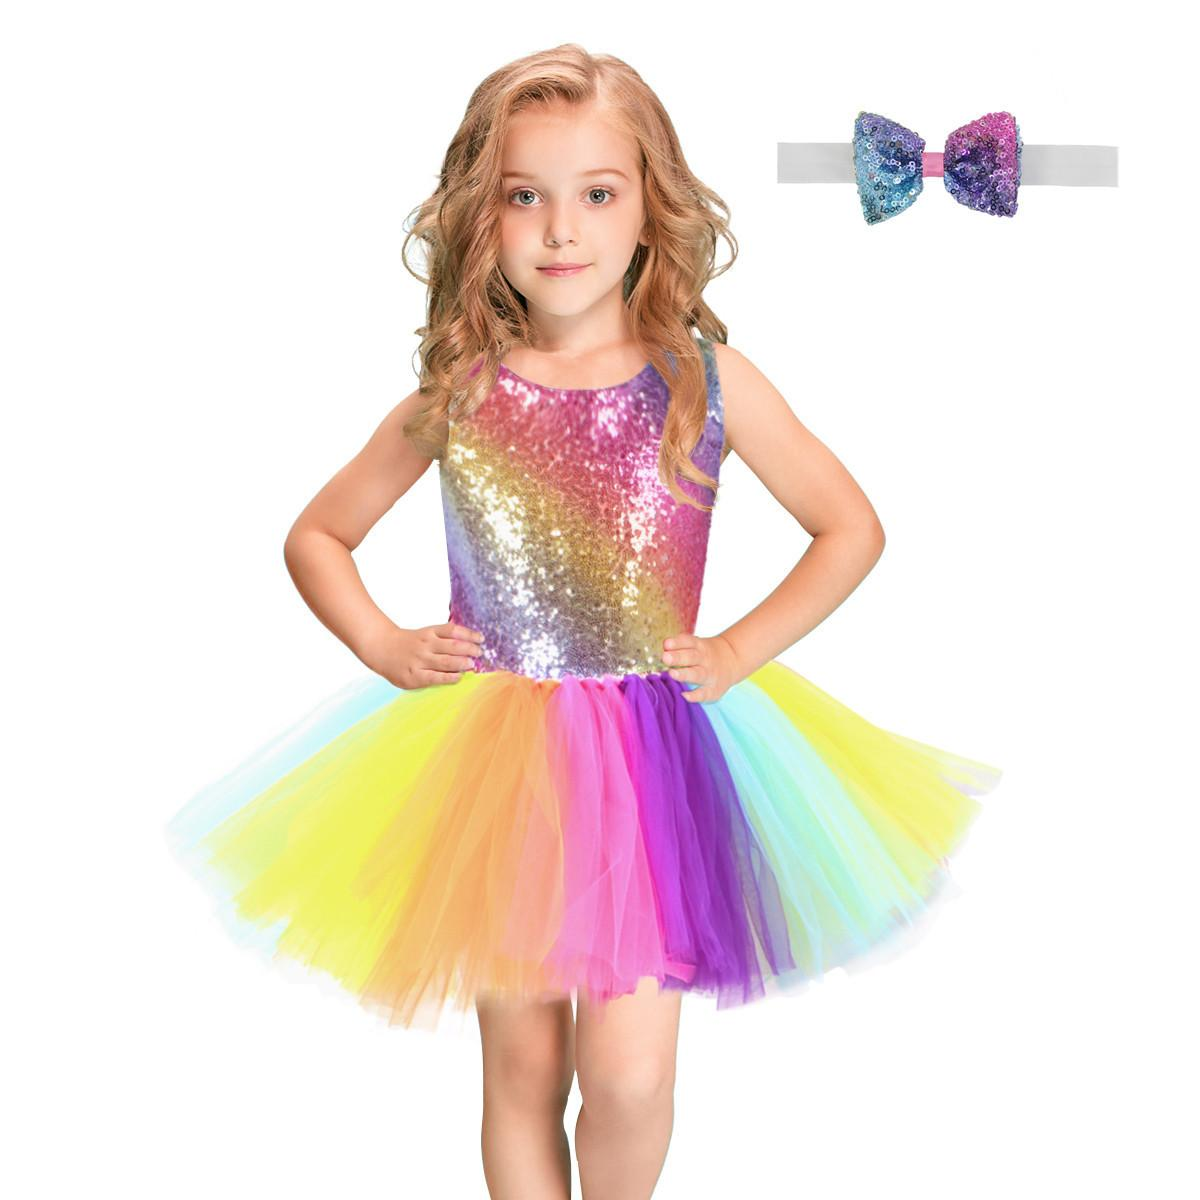 ab91f41eba54 European and American girls dress dance costumes rainbow sequins mesh  colorful pettiskirt suit children's dress